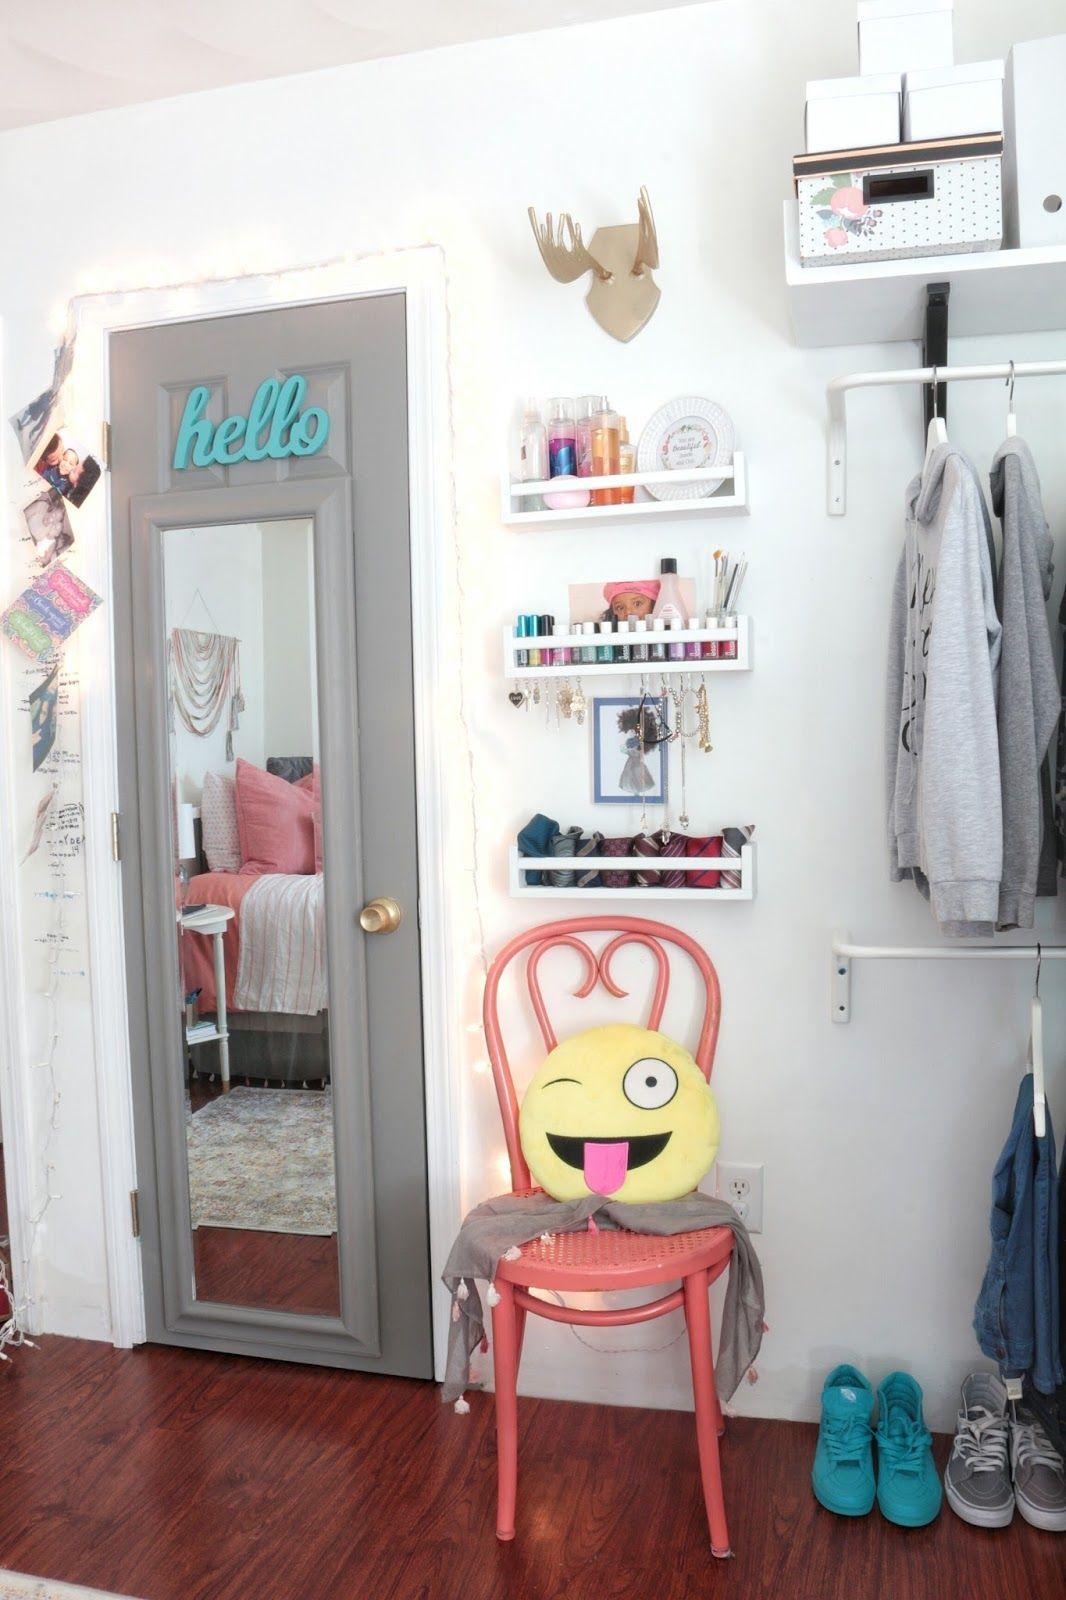 My Daughter's Room: Pre-Teen Bedroom Refresh Reveal images